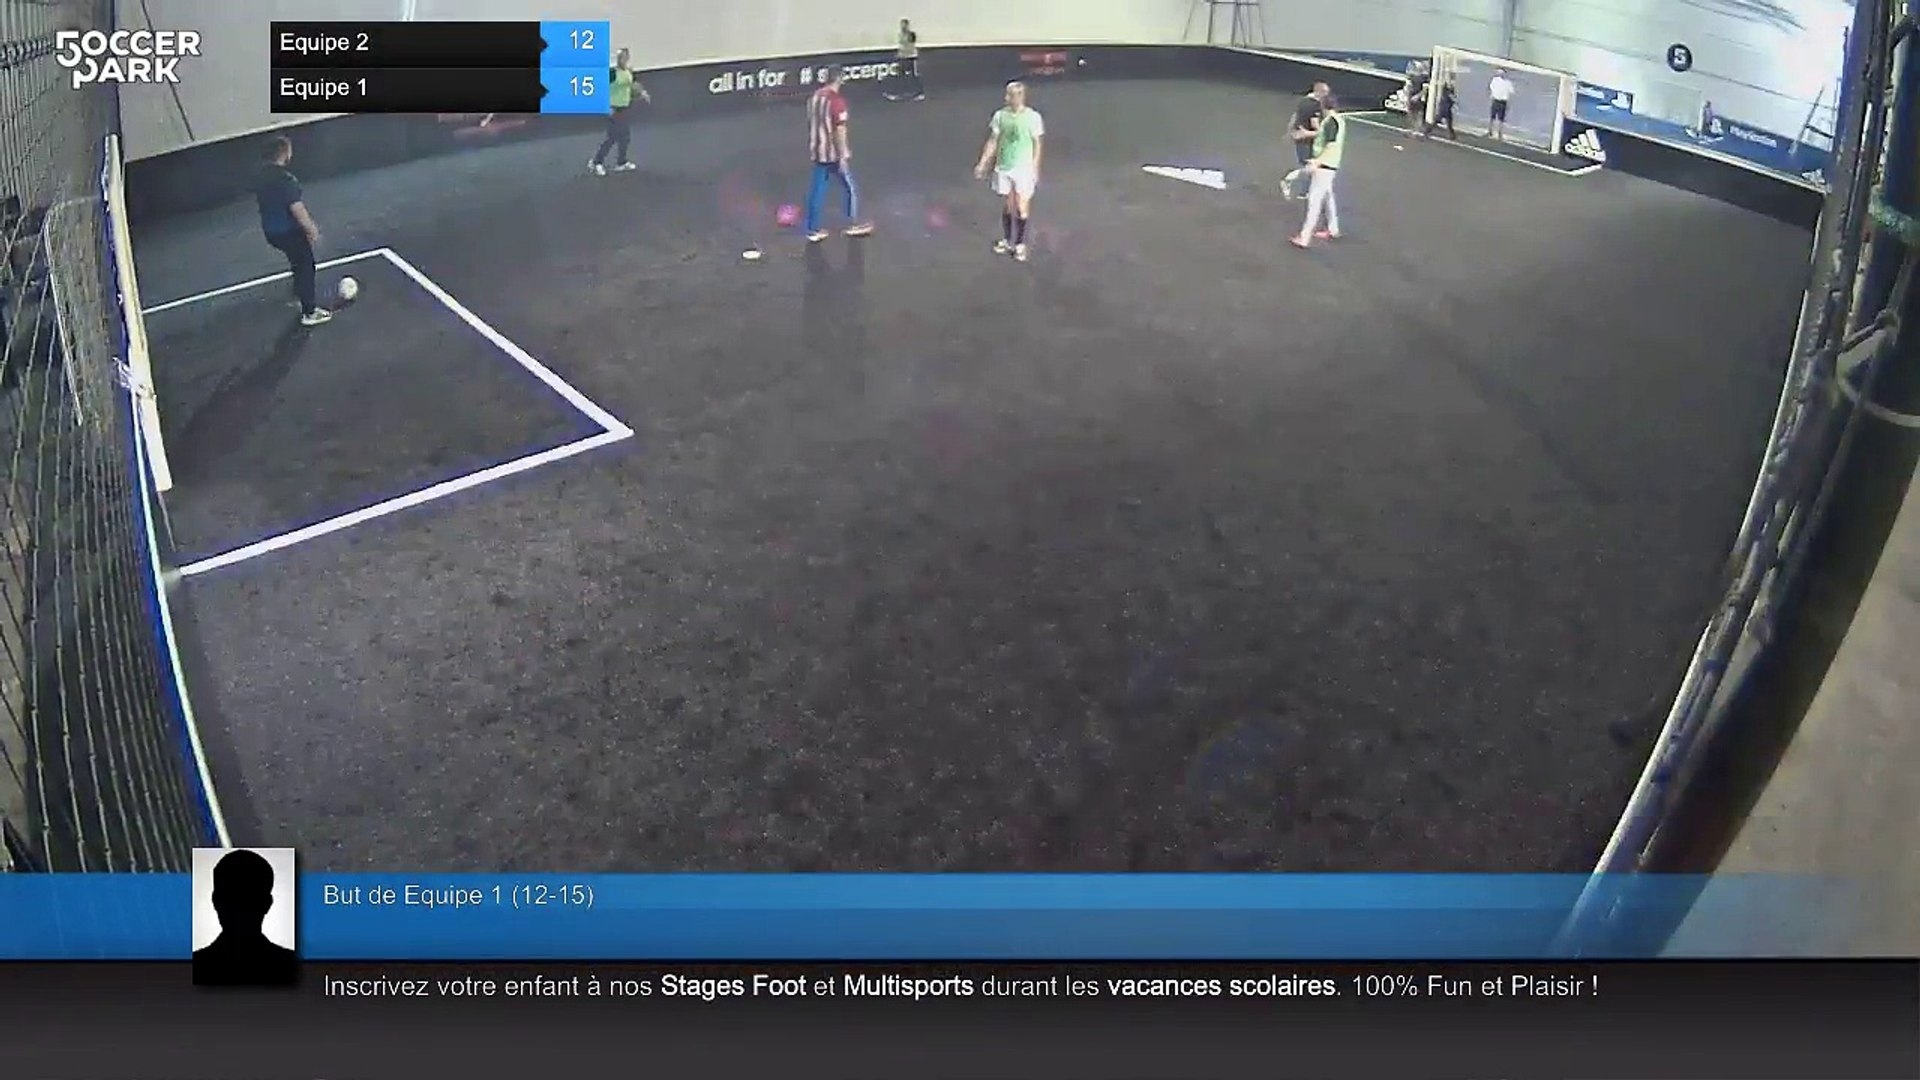 But de Equipe 1 (12-14) - Equipe 2 Vs Equipe 1 - 14/04/18 20:14 - Loisir Orléans